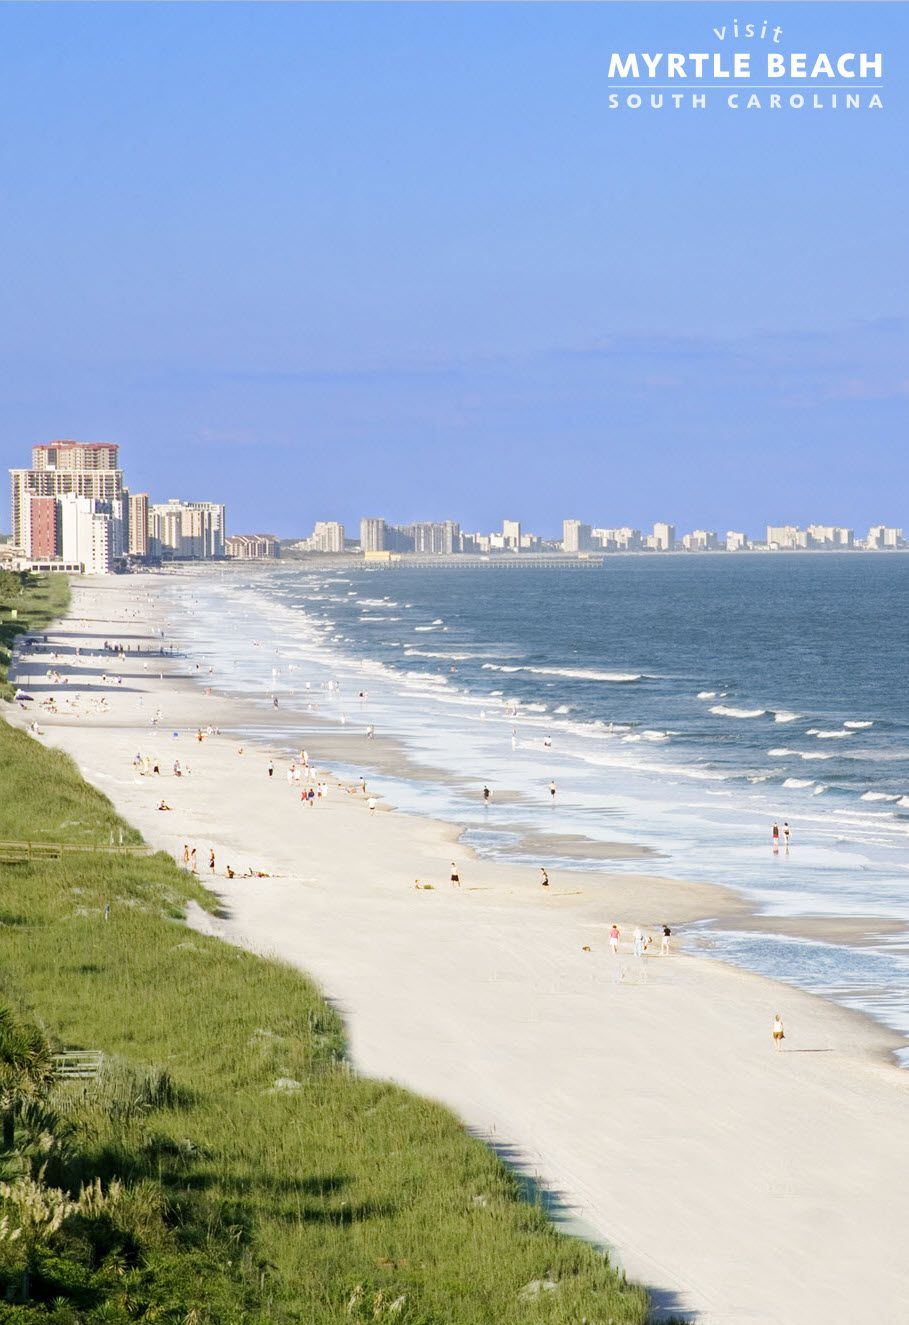 Myrtle Beach Hotels Resorts Motels Vacation Rentals Beach House And Condo Rentals Myrtle Beach Hotels Beach Hotels Myrtle Beach